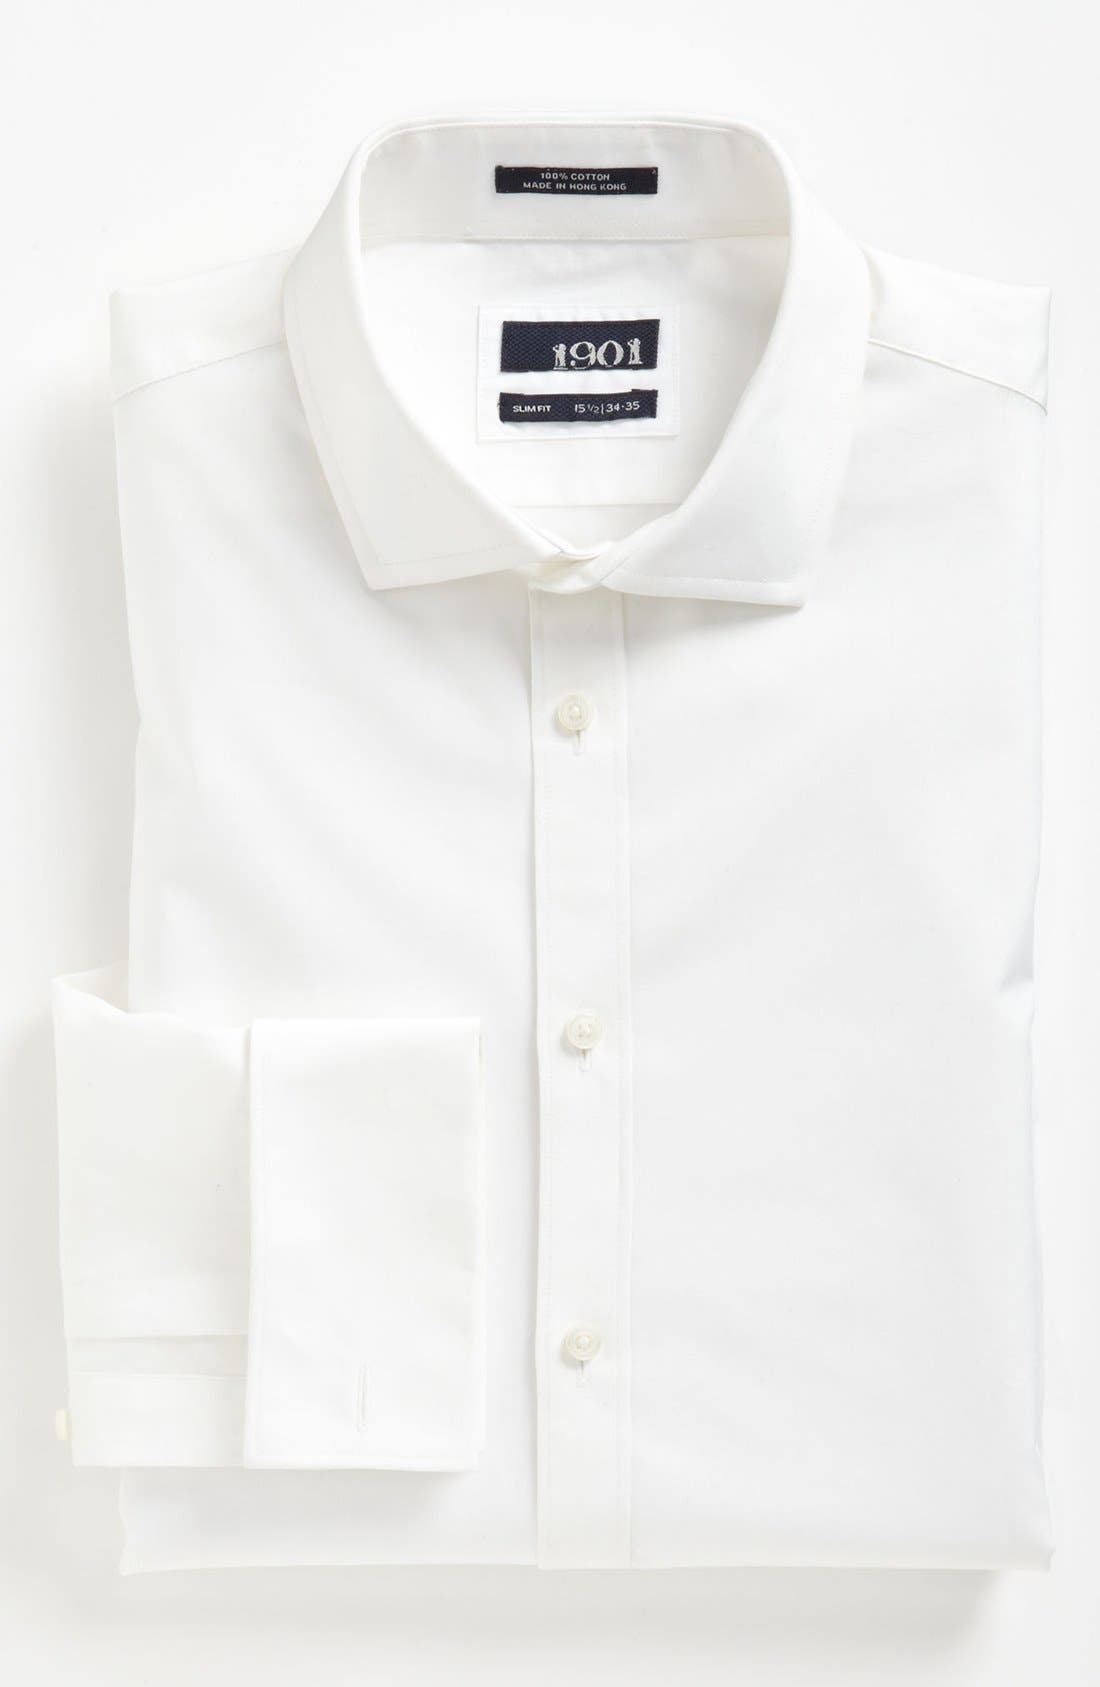 Main Image - 1901 Dress Shirt & Gitman Tie